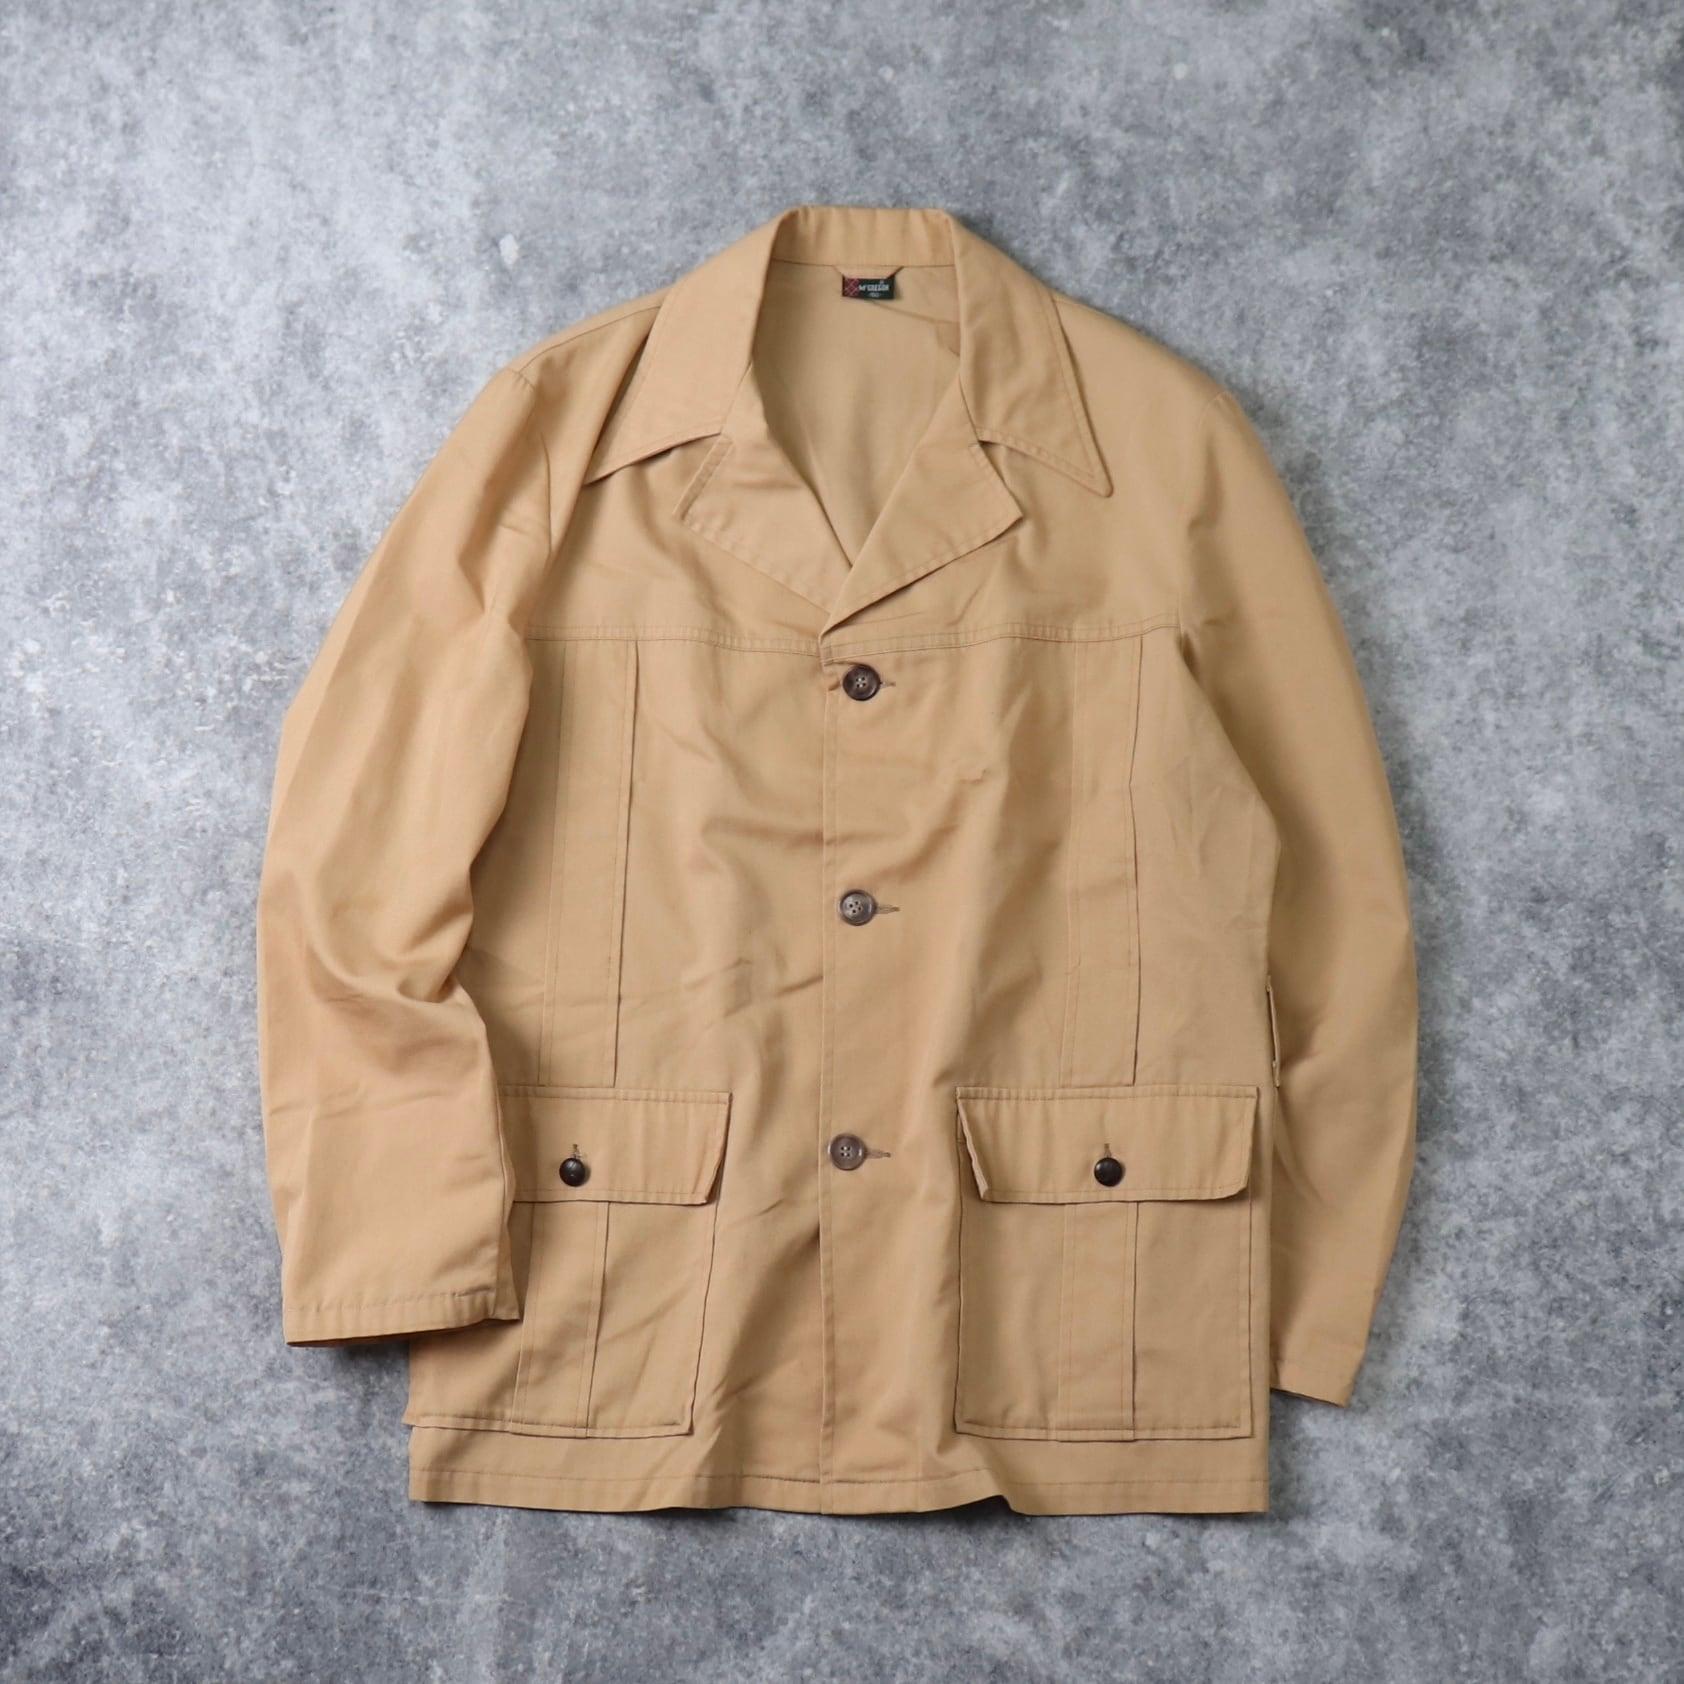 70's McGREGOR Shirt jacket 70年代 マクレガー マックレガー シャツジャケット ポリジャケ ポリシャツ ヒッピー ヴィンテージ  古着 A524